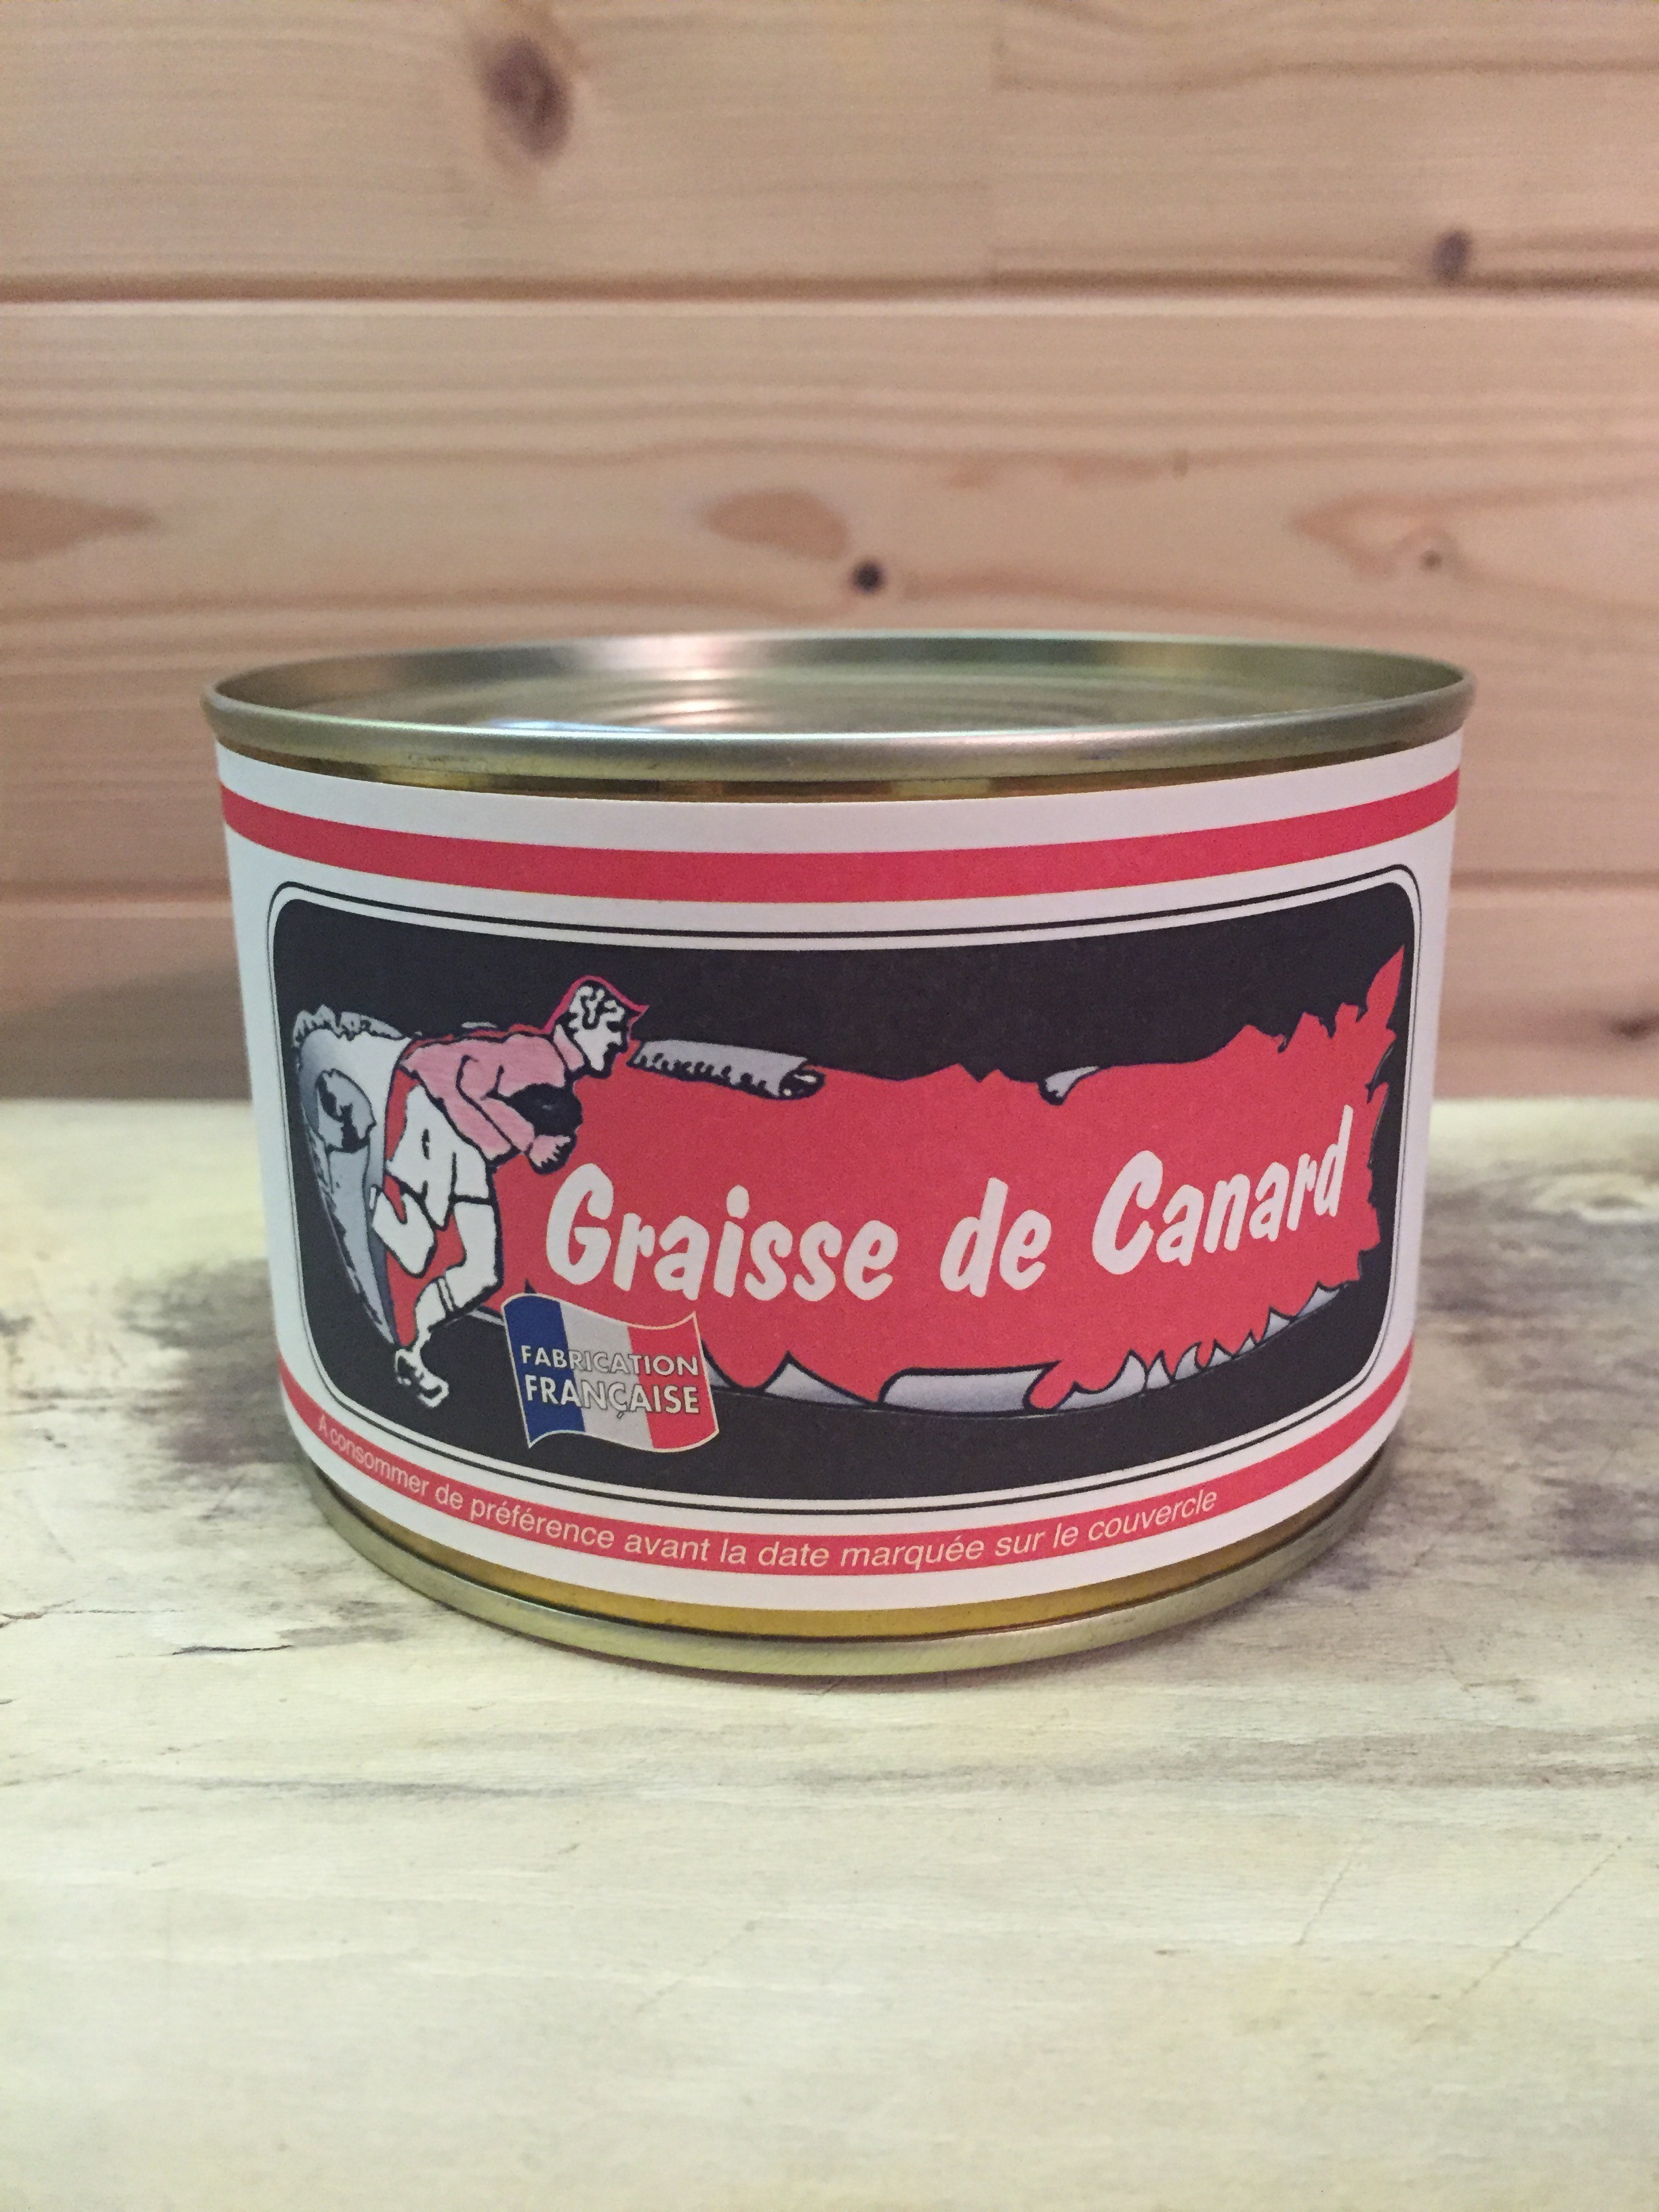 GRAISSE DE CANARD 380g